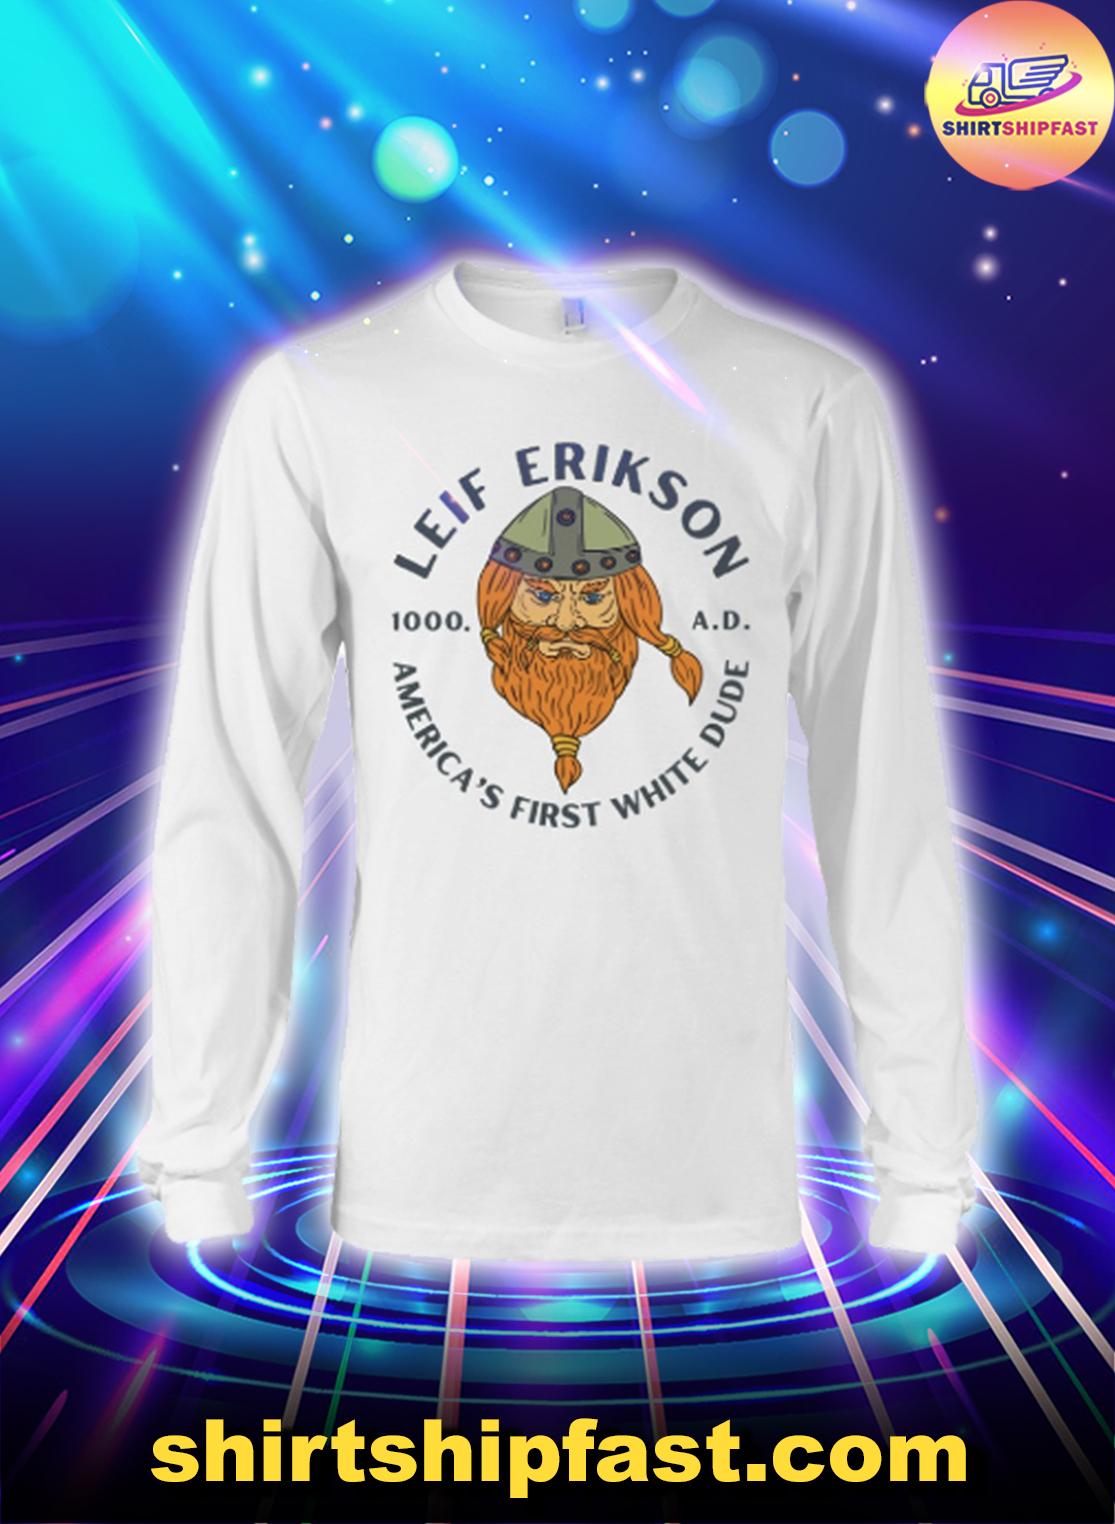 Leif-Erikson-Americas-first-white-dude-long-sleeve-tee